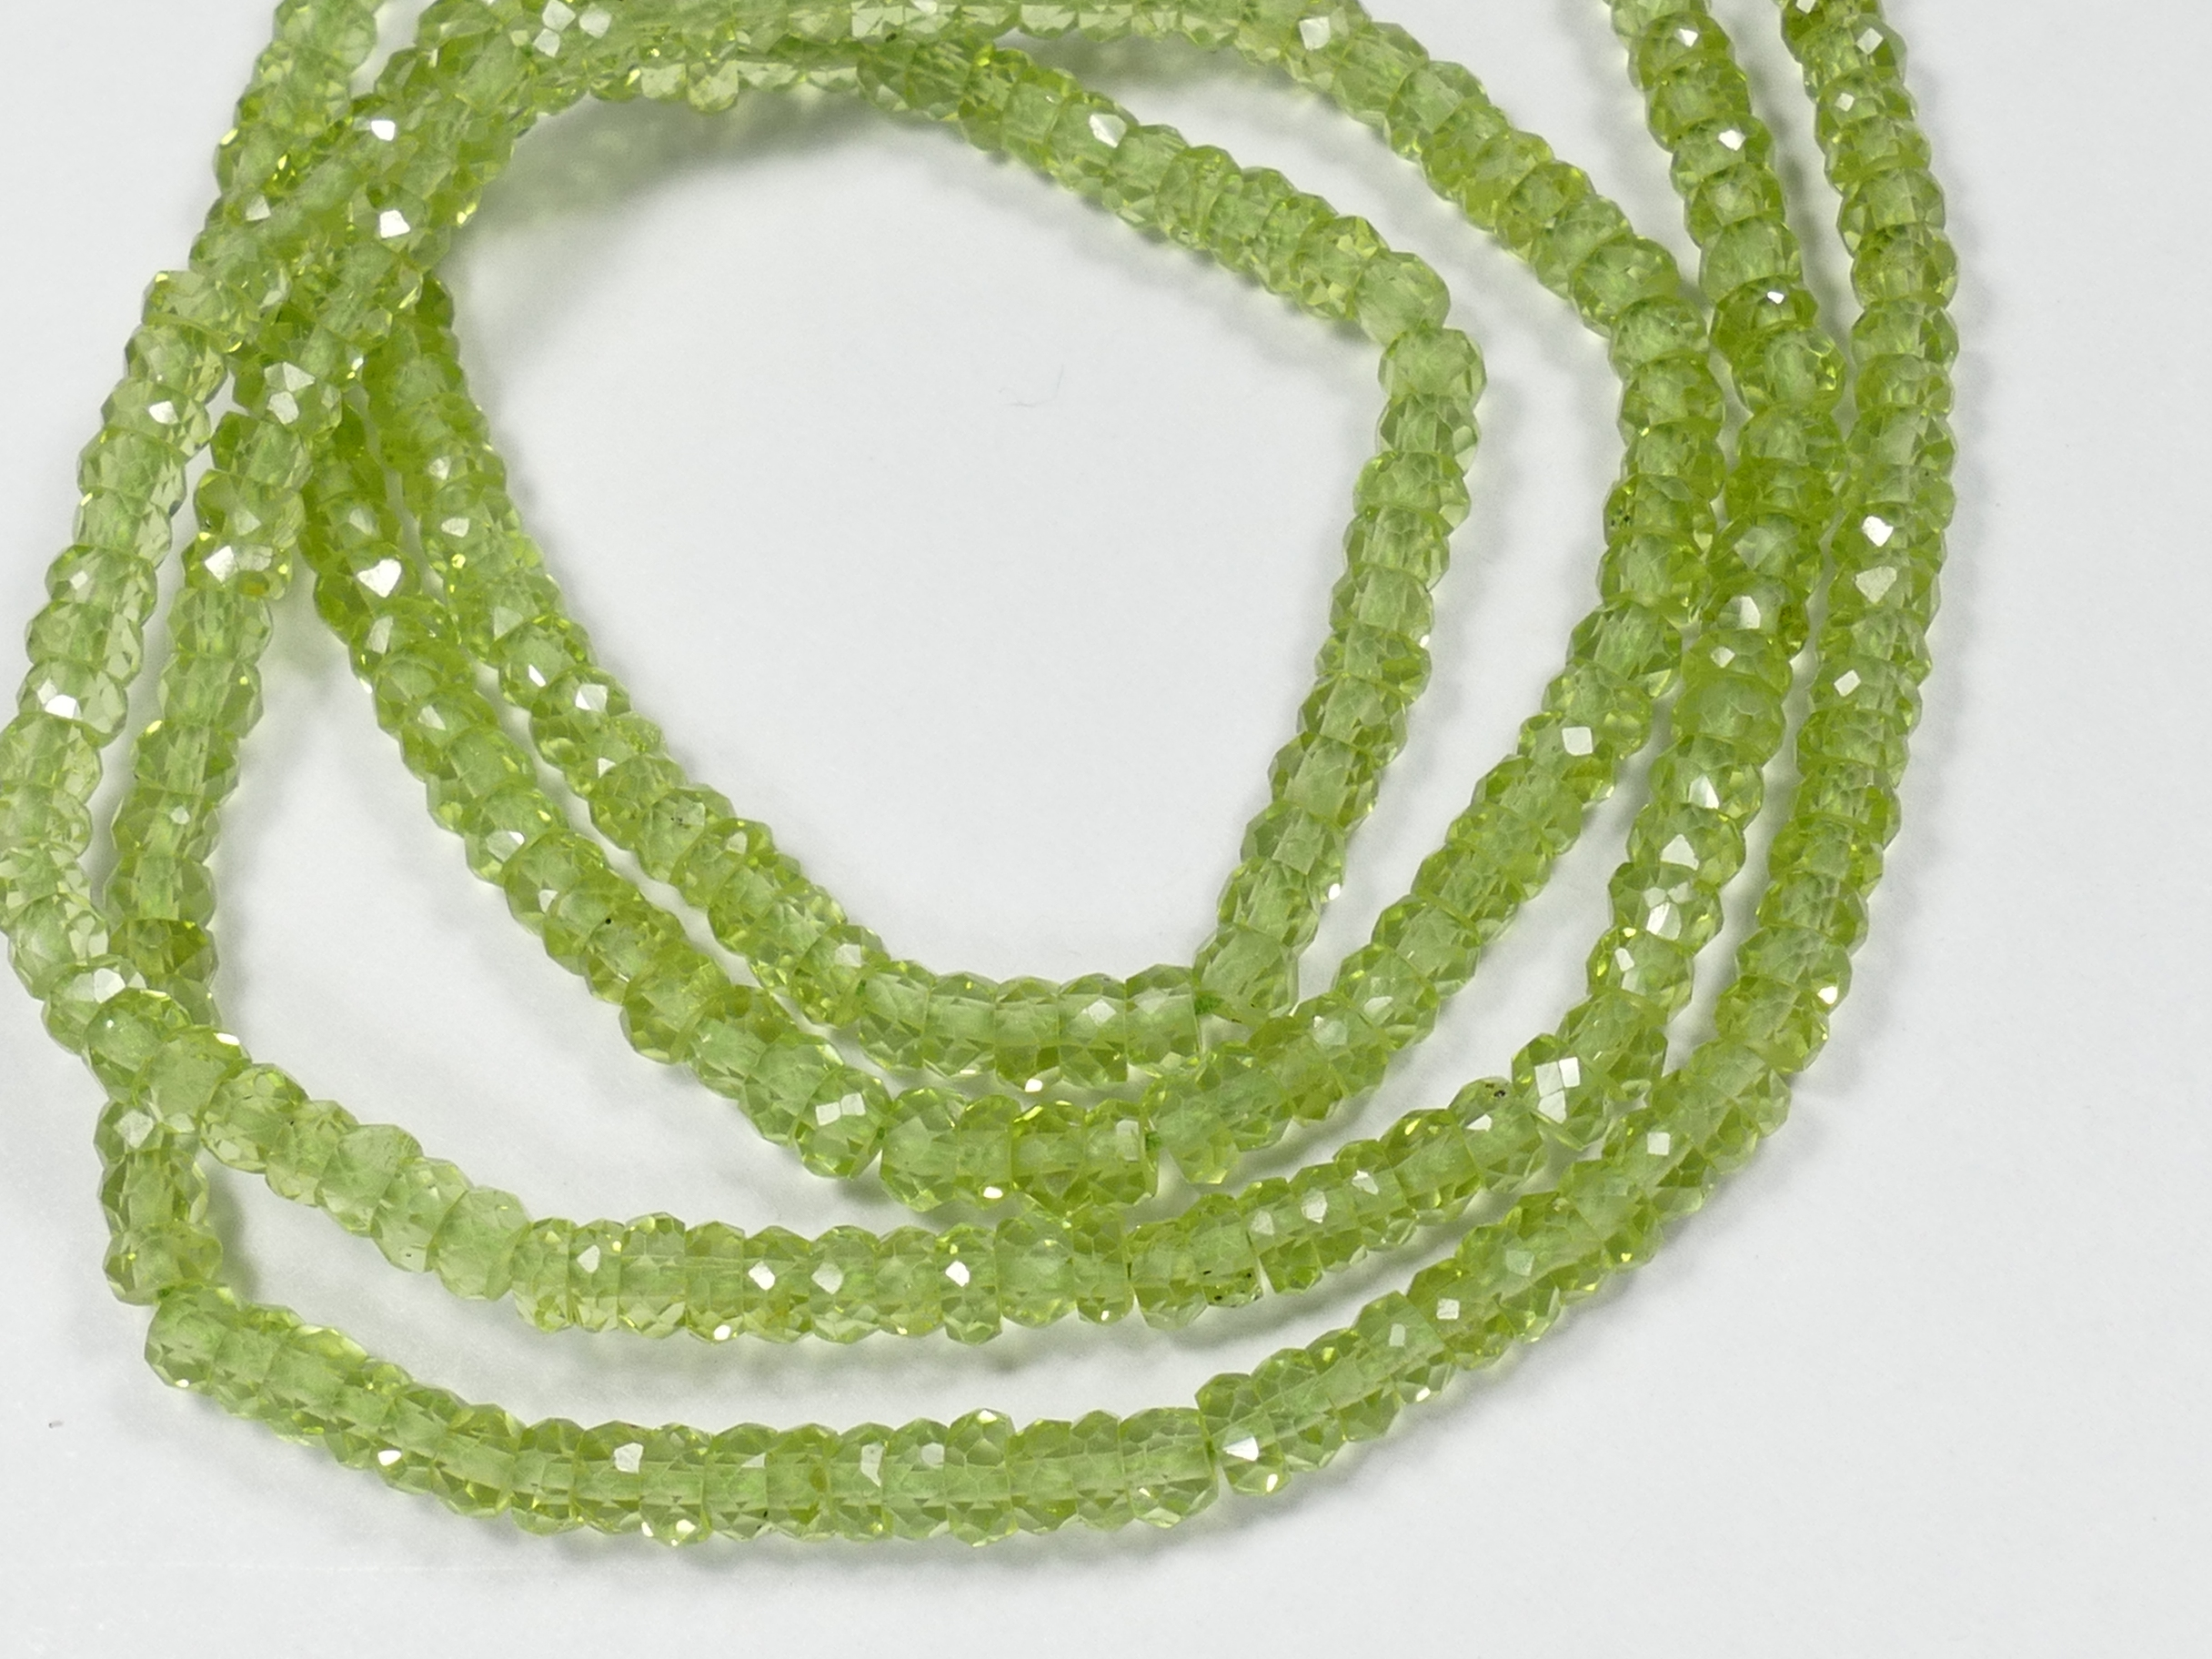 3mm AAA/AAA+ Perles de Péridot naturel en rondelle facettée Olivine x10cm (3.9inch) (#AC908)